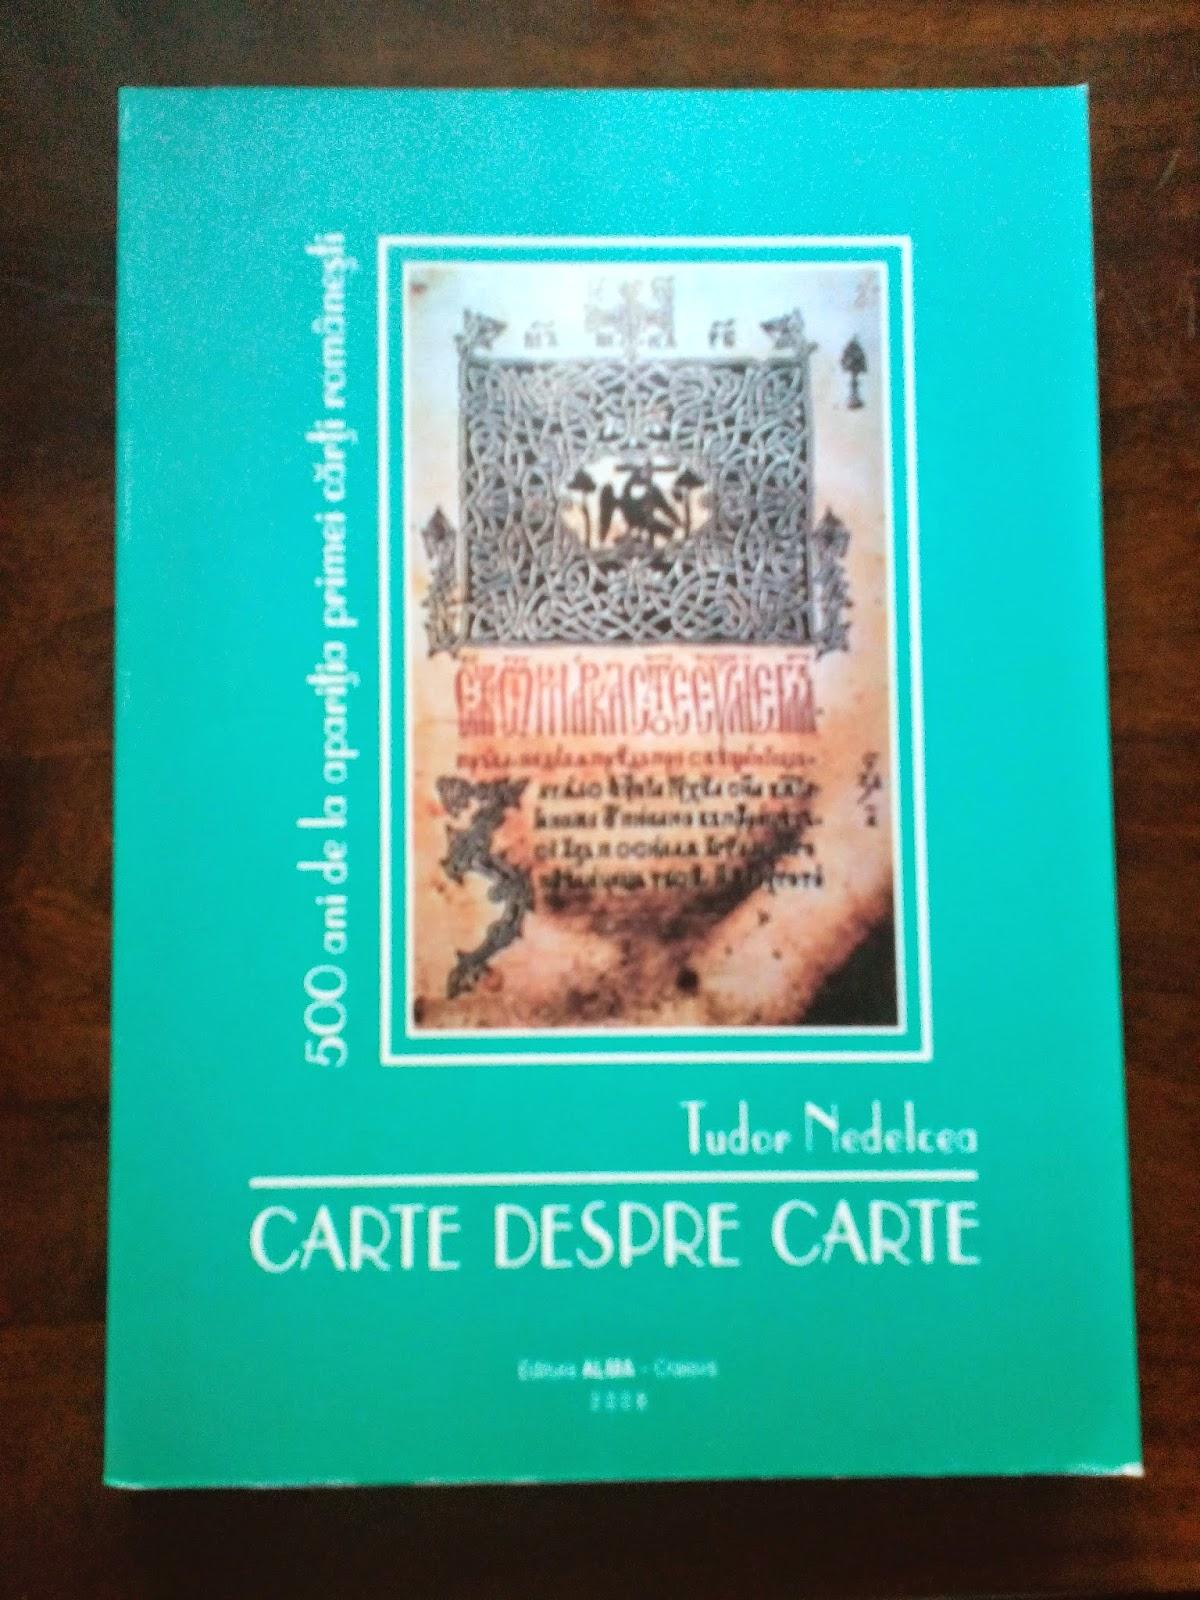 Tudor Nedelcea - Carte despre carte